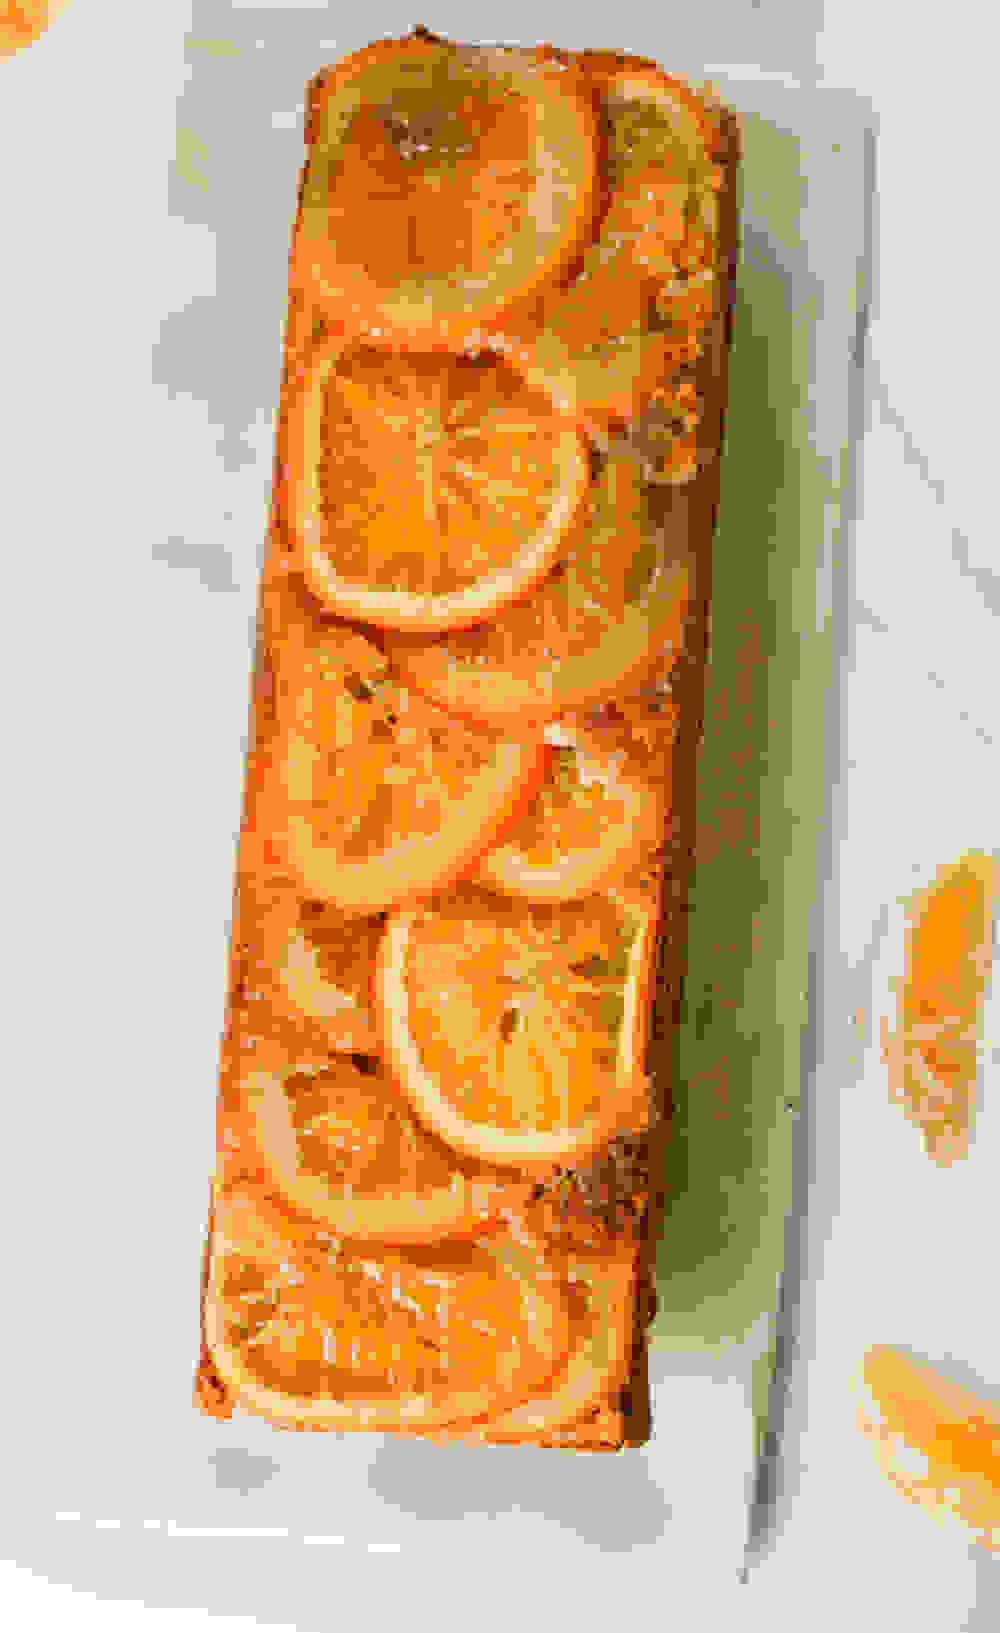 upside down orange cake and slices of orange